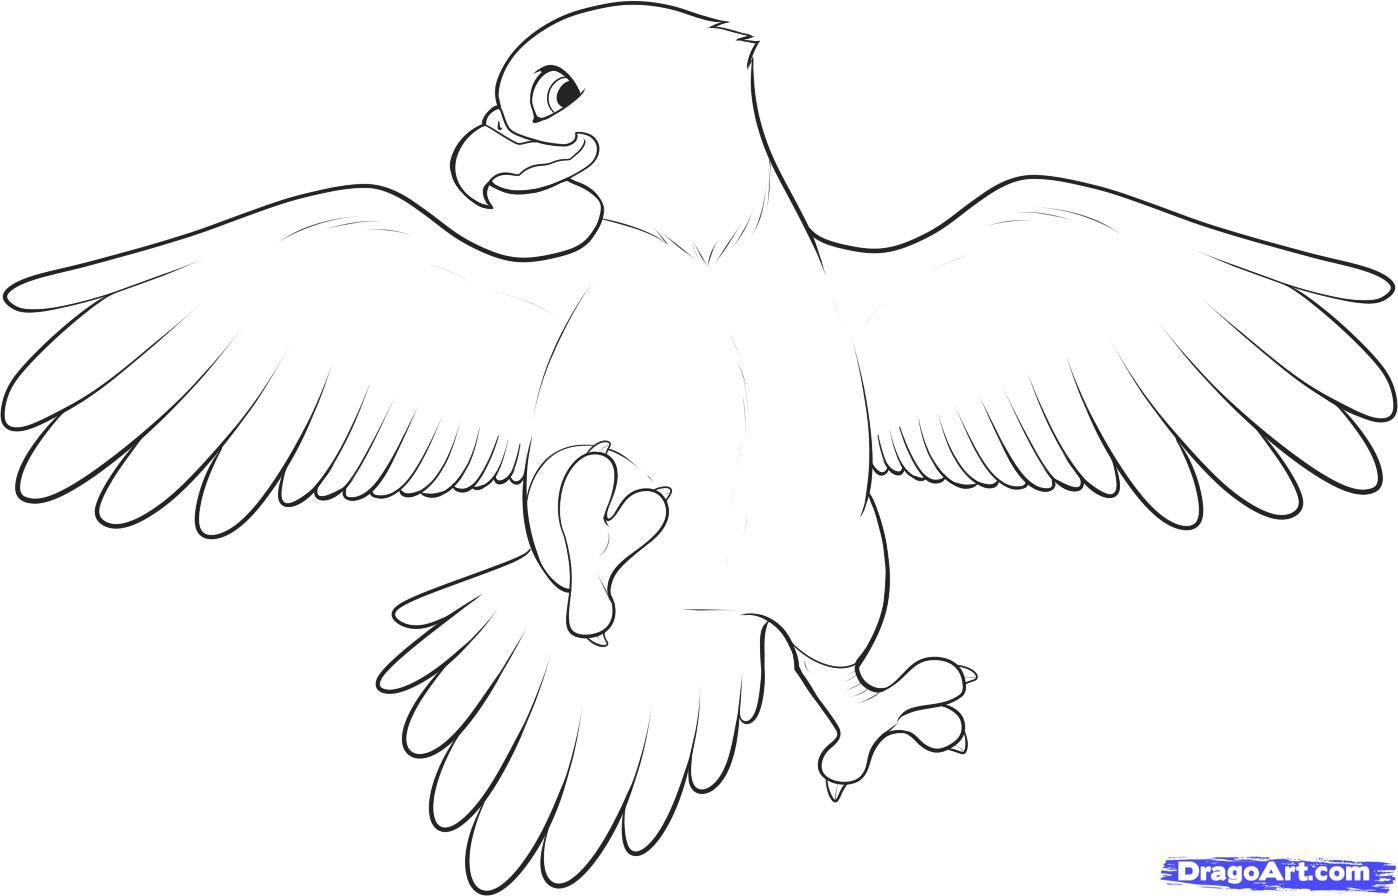 1398x896 Cartoon Eagle Drawing How To Draw An Easy Eagle, Stepstep, Birds